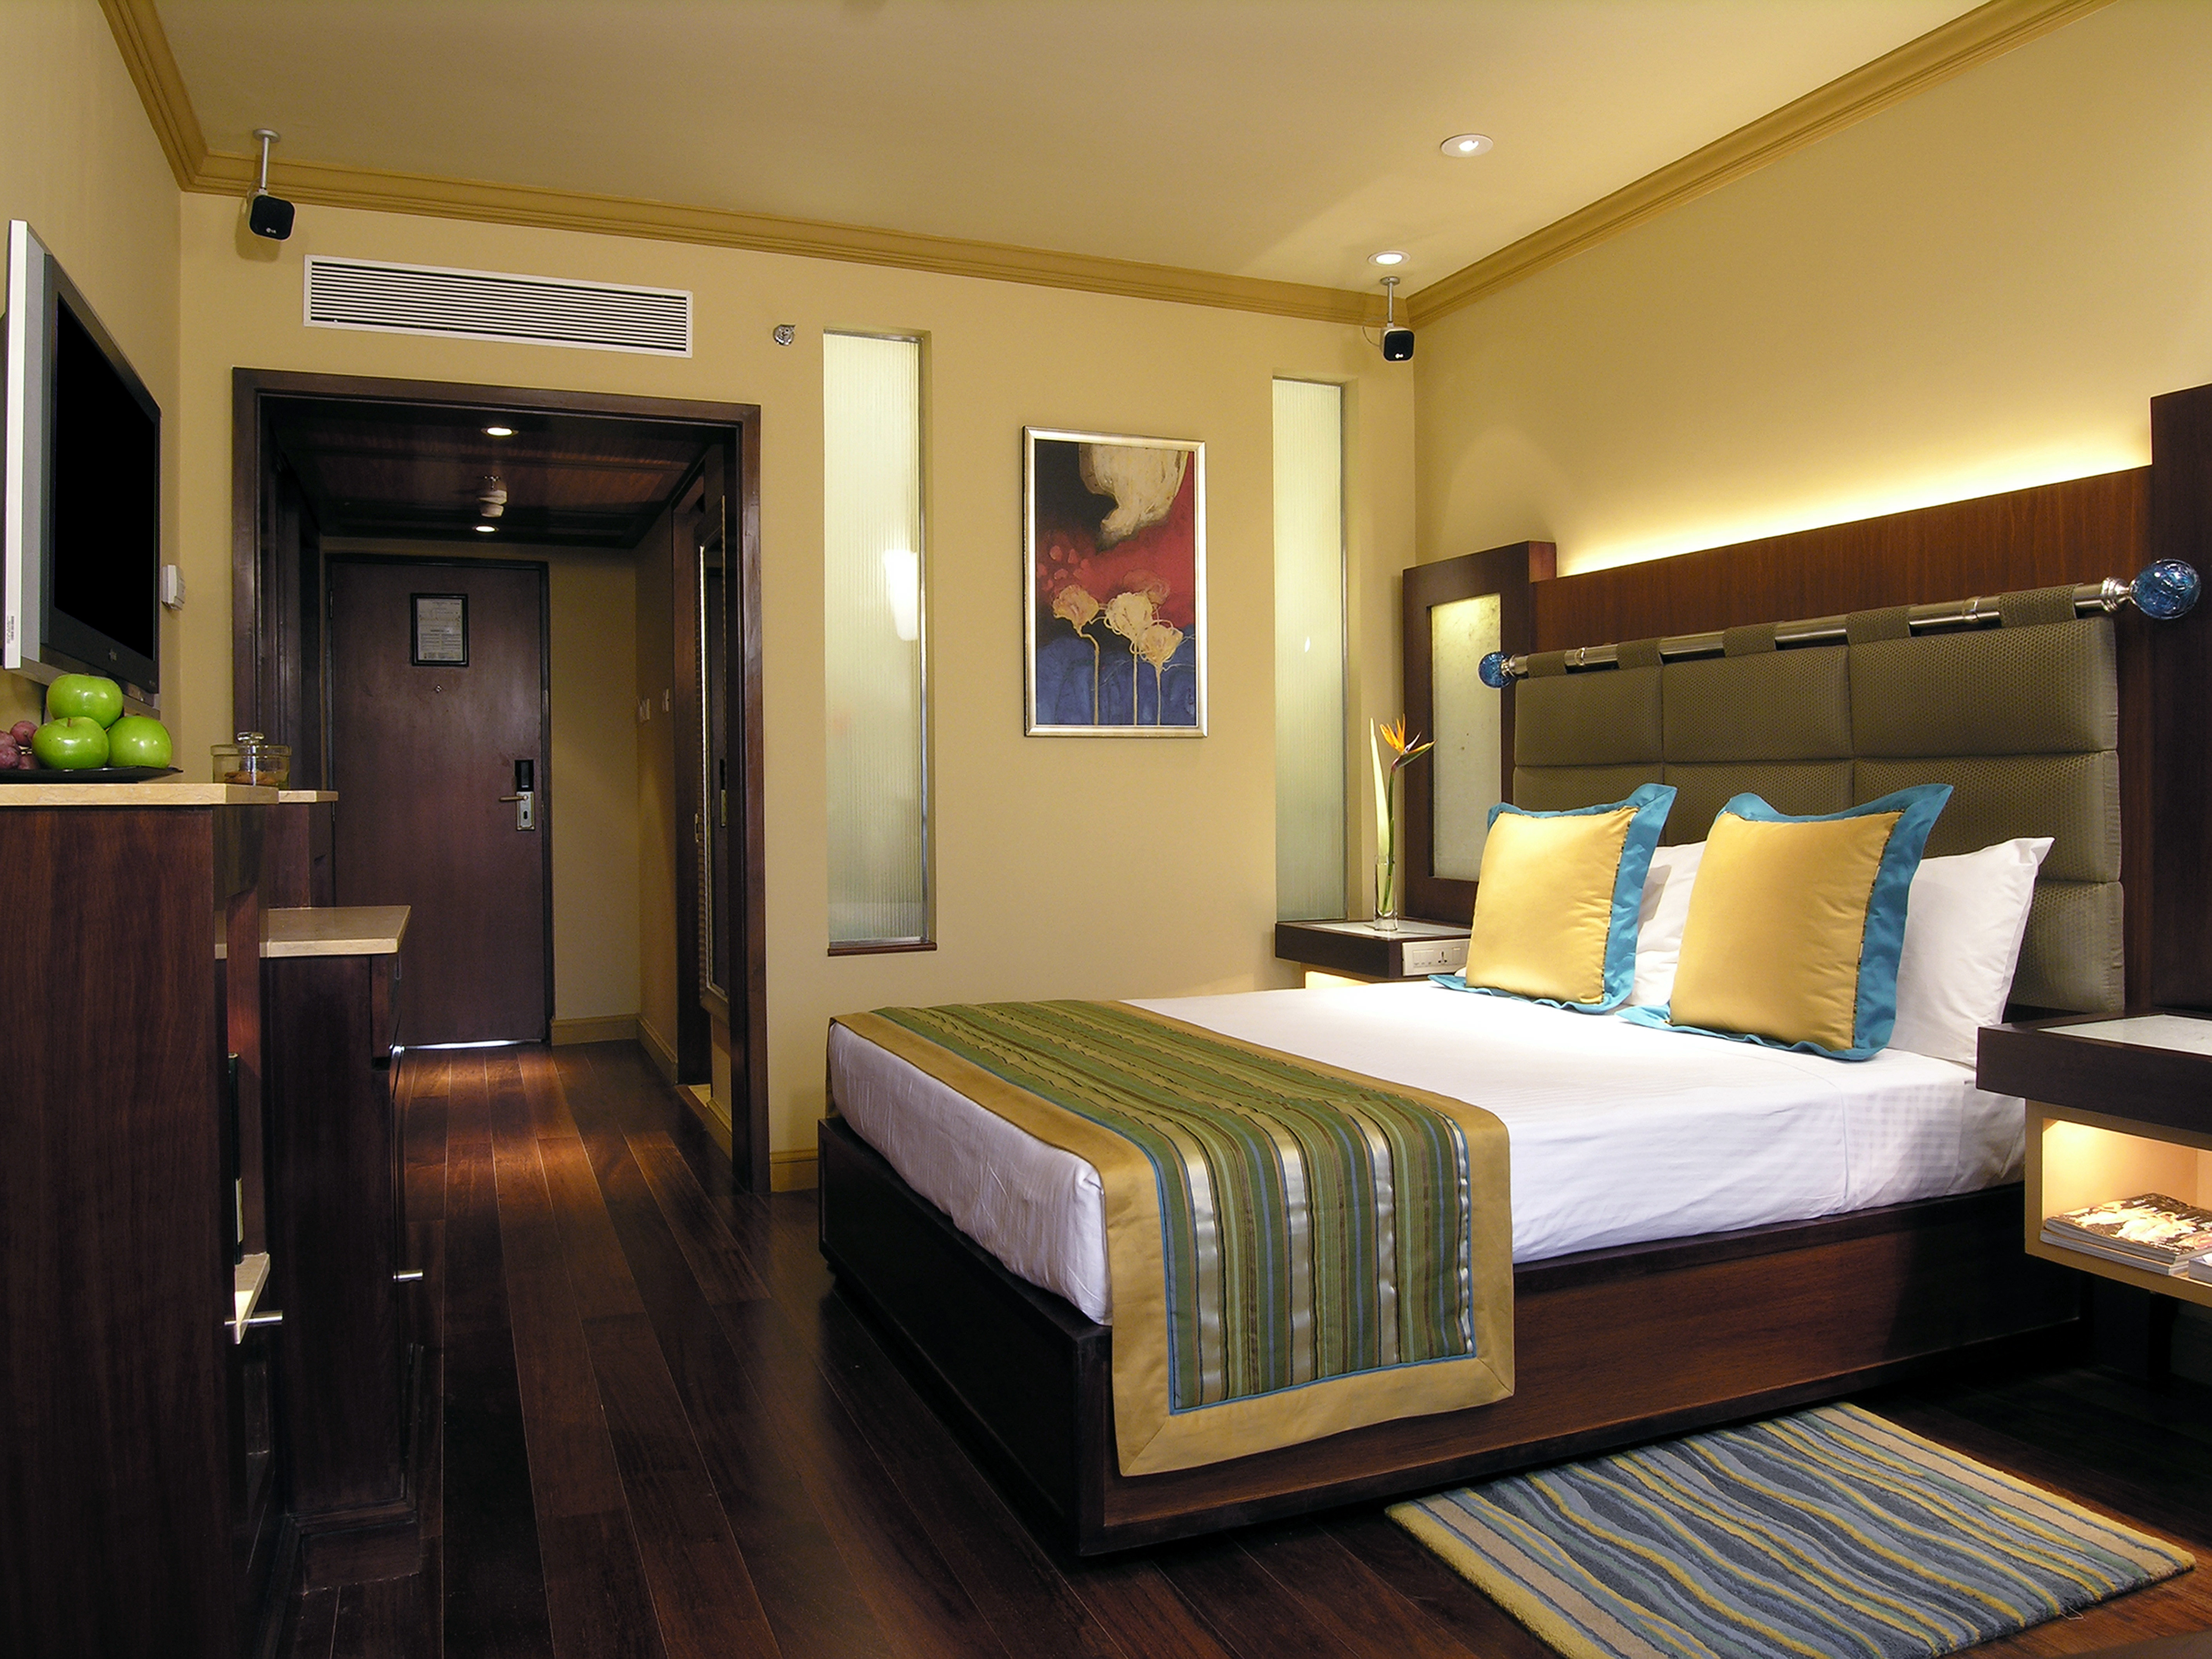 Bedroom Business property Suite home living room condominium cottage Resort Villa